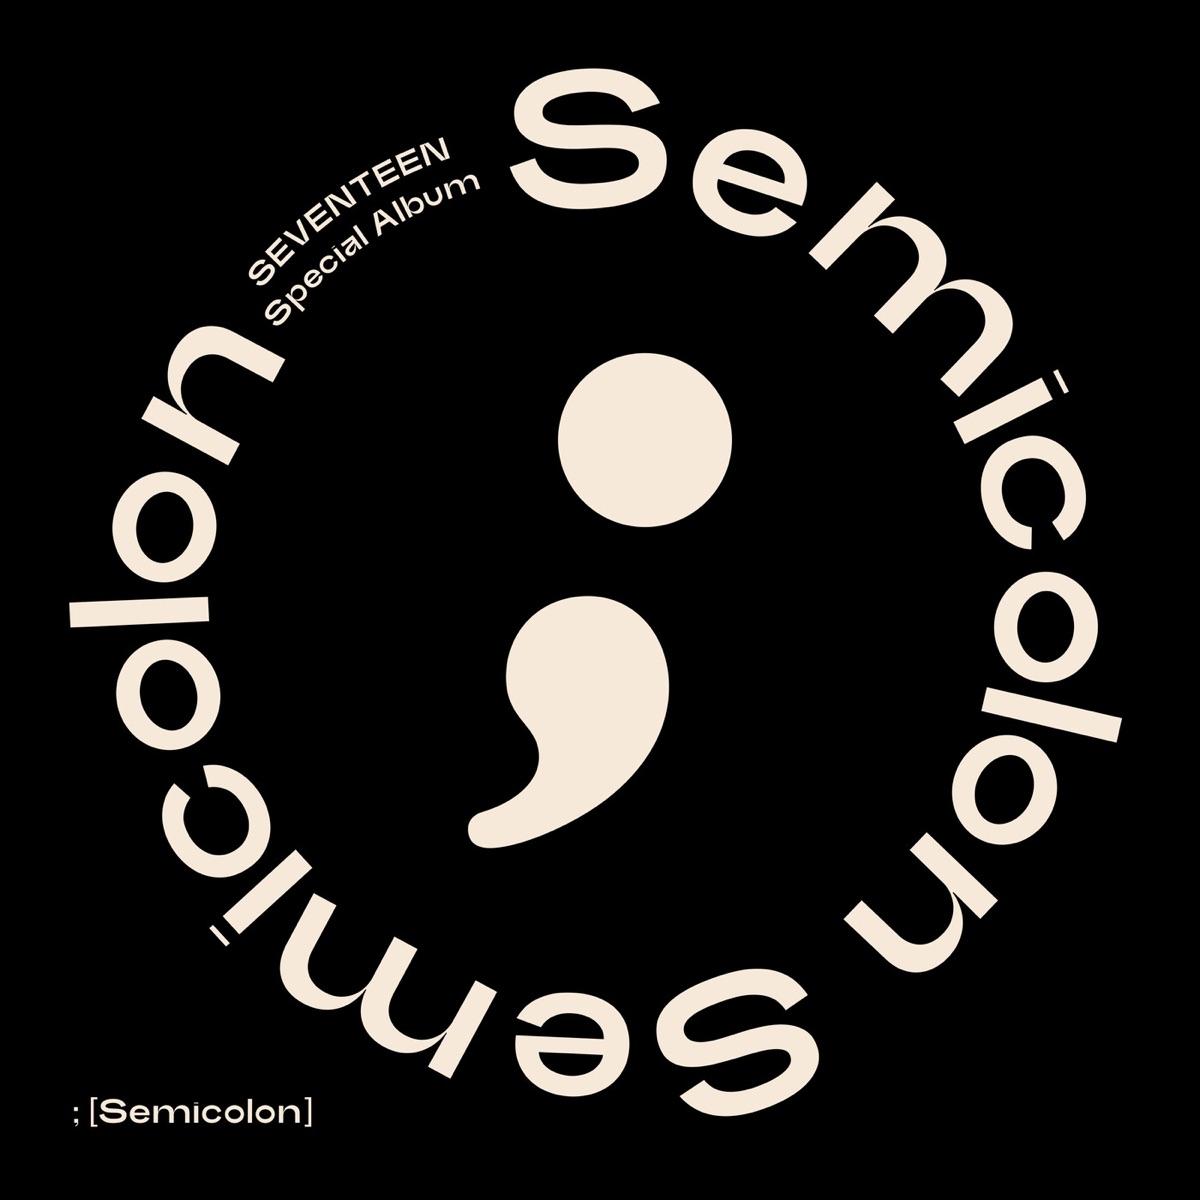 『SEVENTEEN - HEY BUDDY』収録の『; (Semicolon)』ジャケット